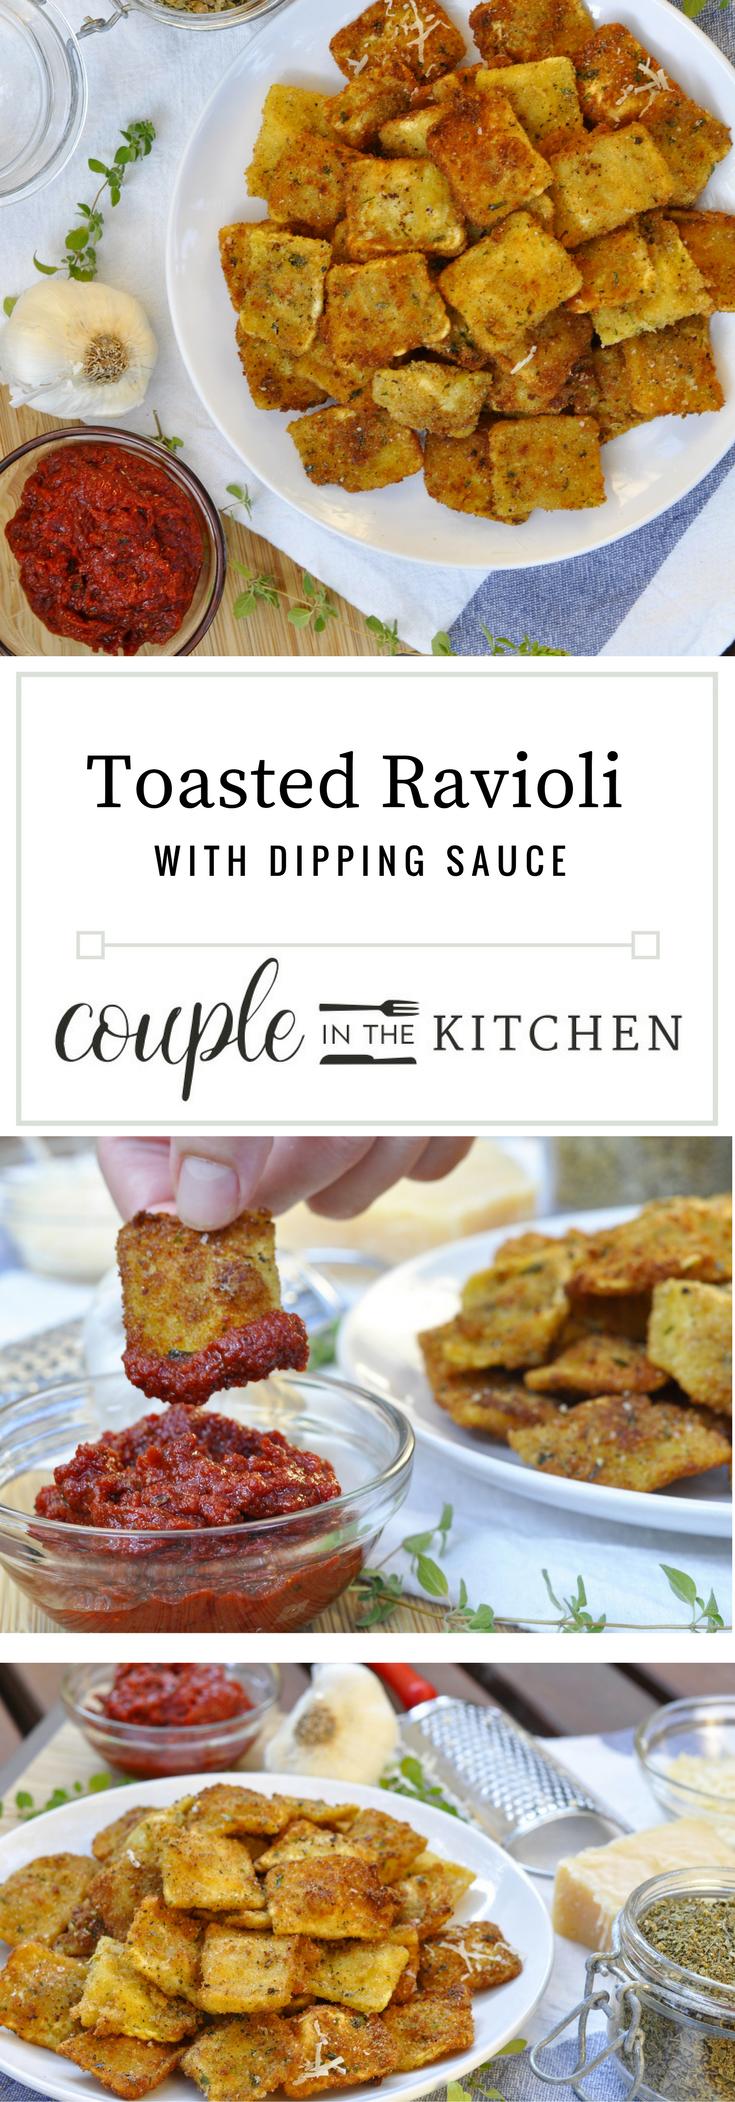 Toasted Ravioli Recipe | coupleinthekitchen.com